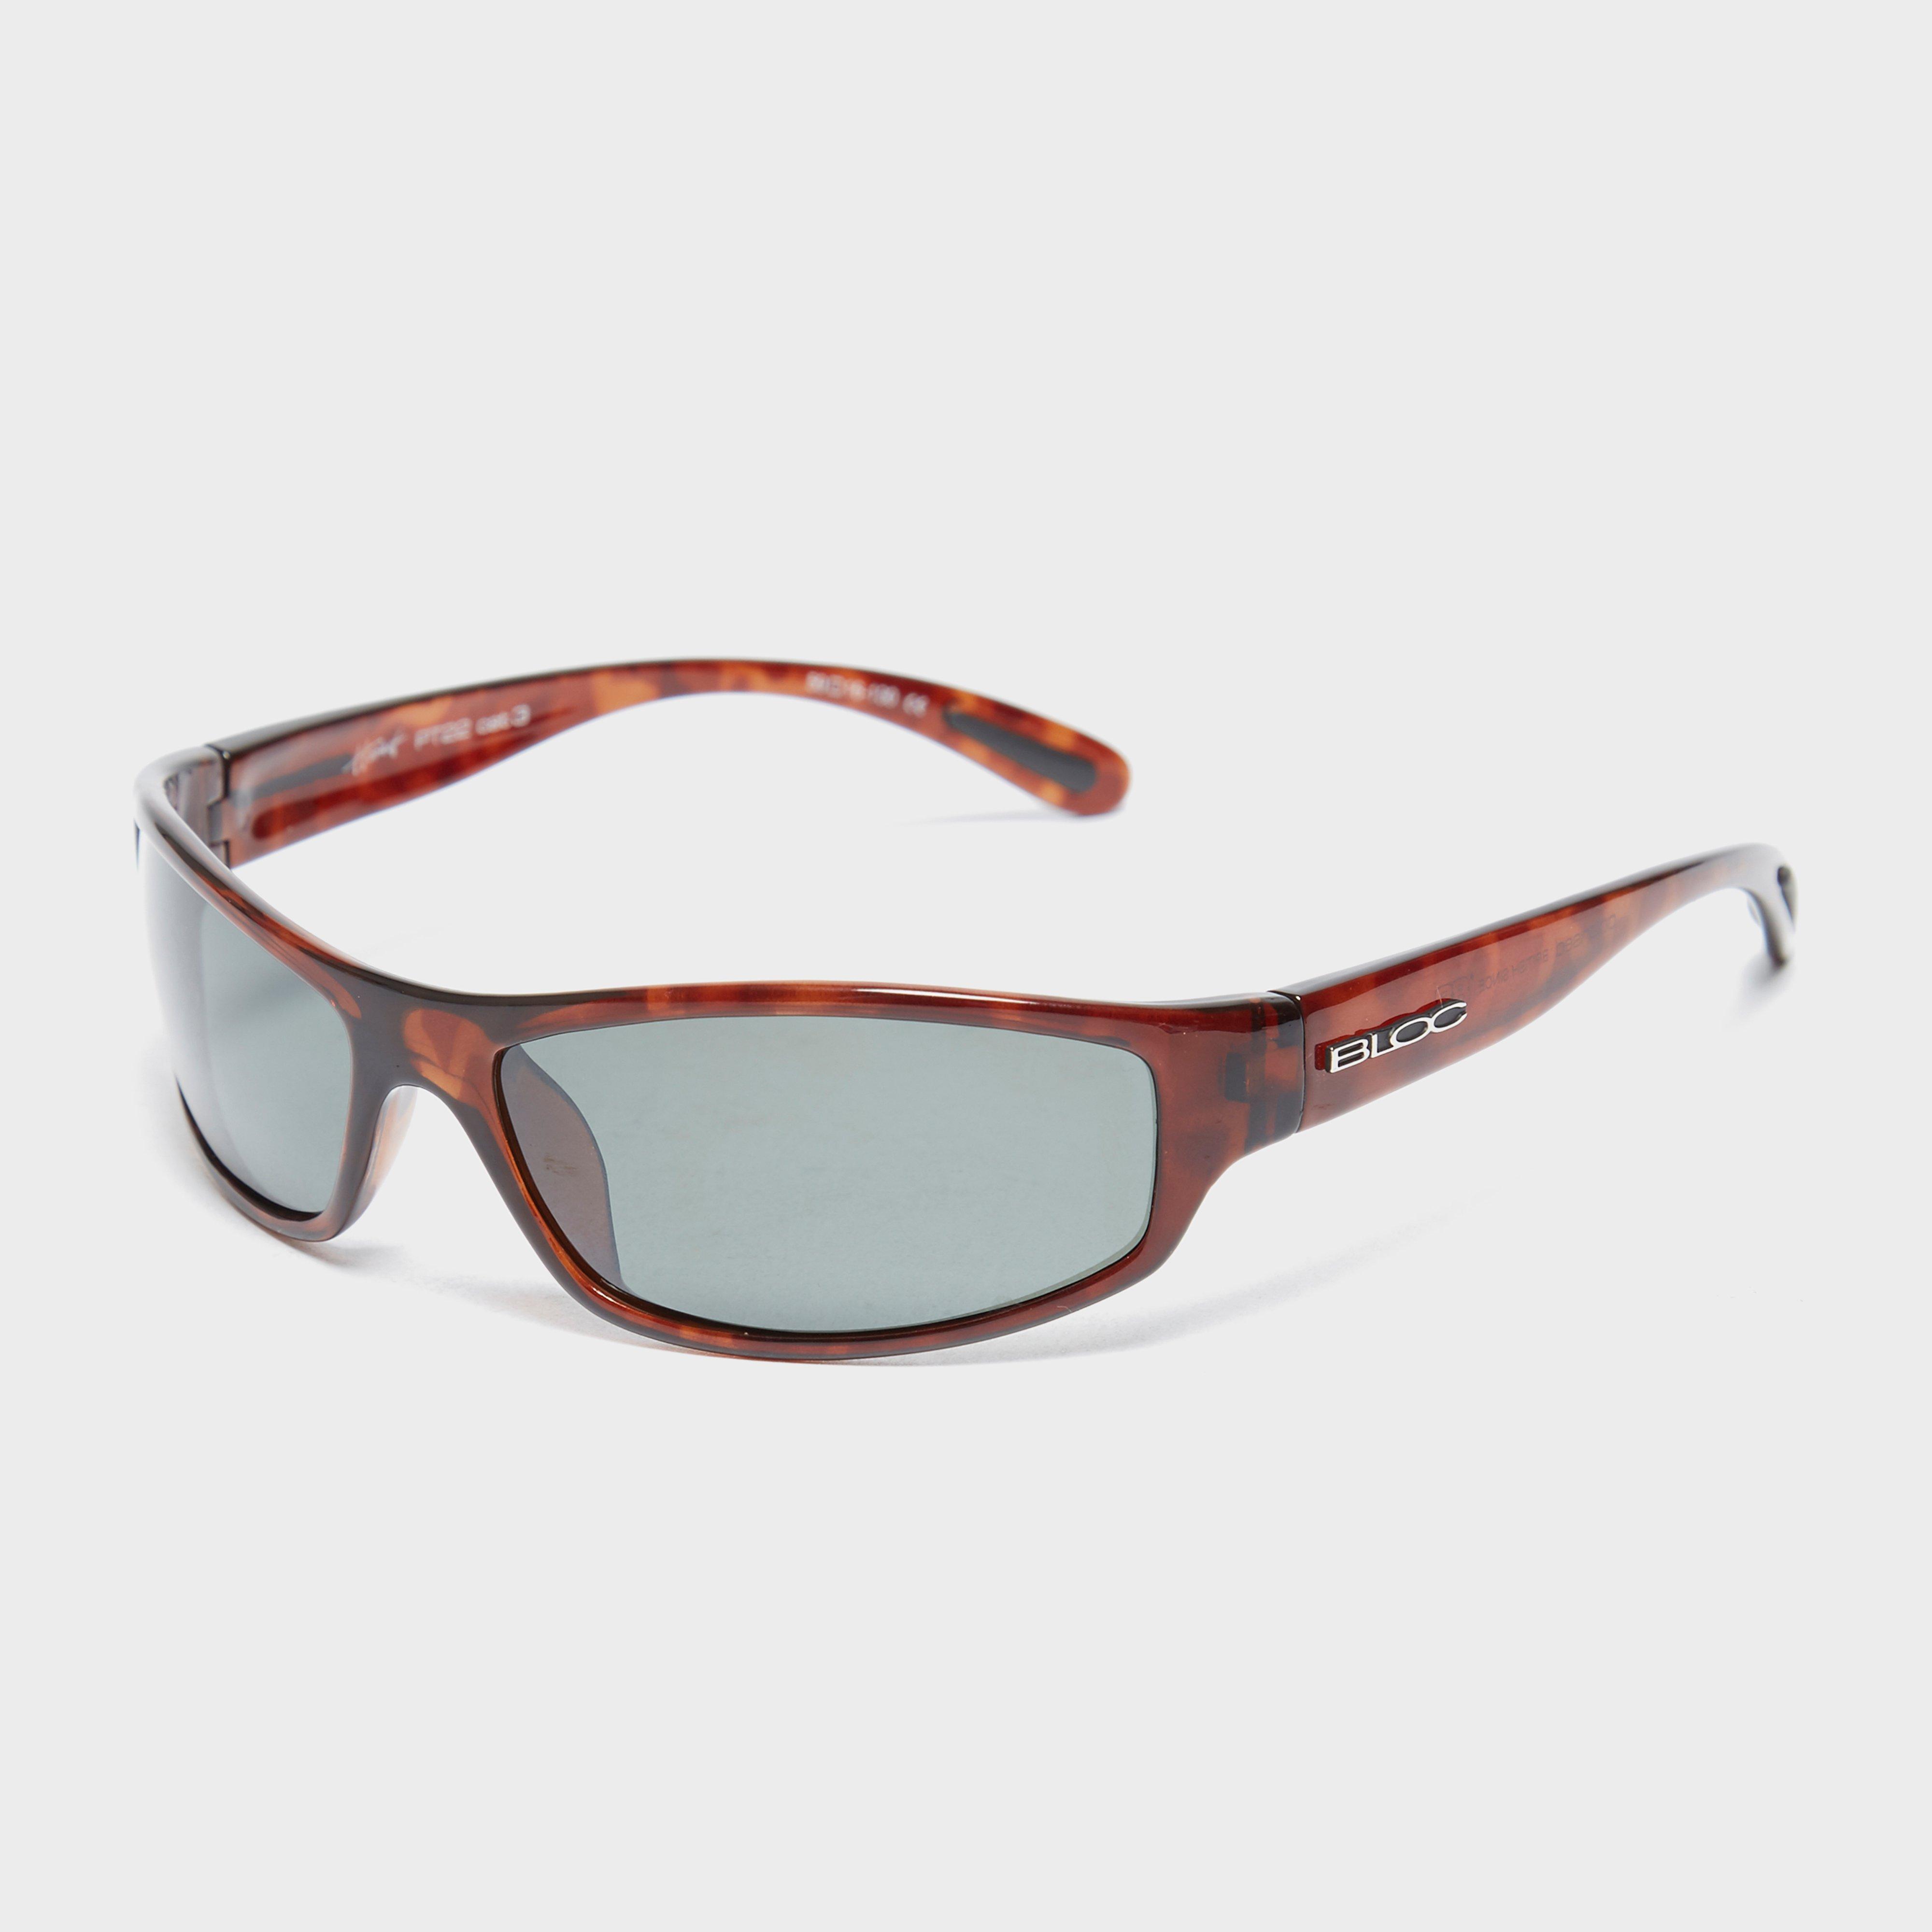 Bloc Bloc Hornet PT22 Sunglasses - Brown, Brown